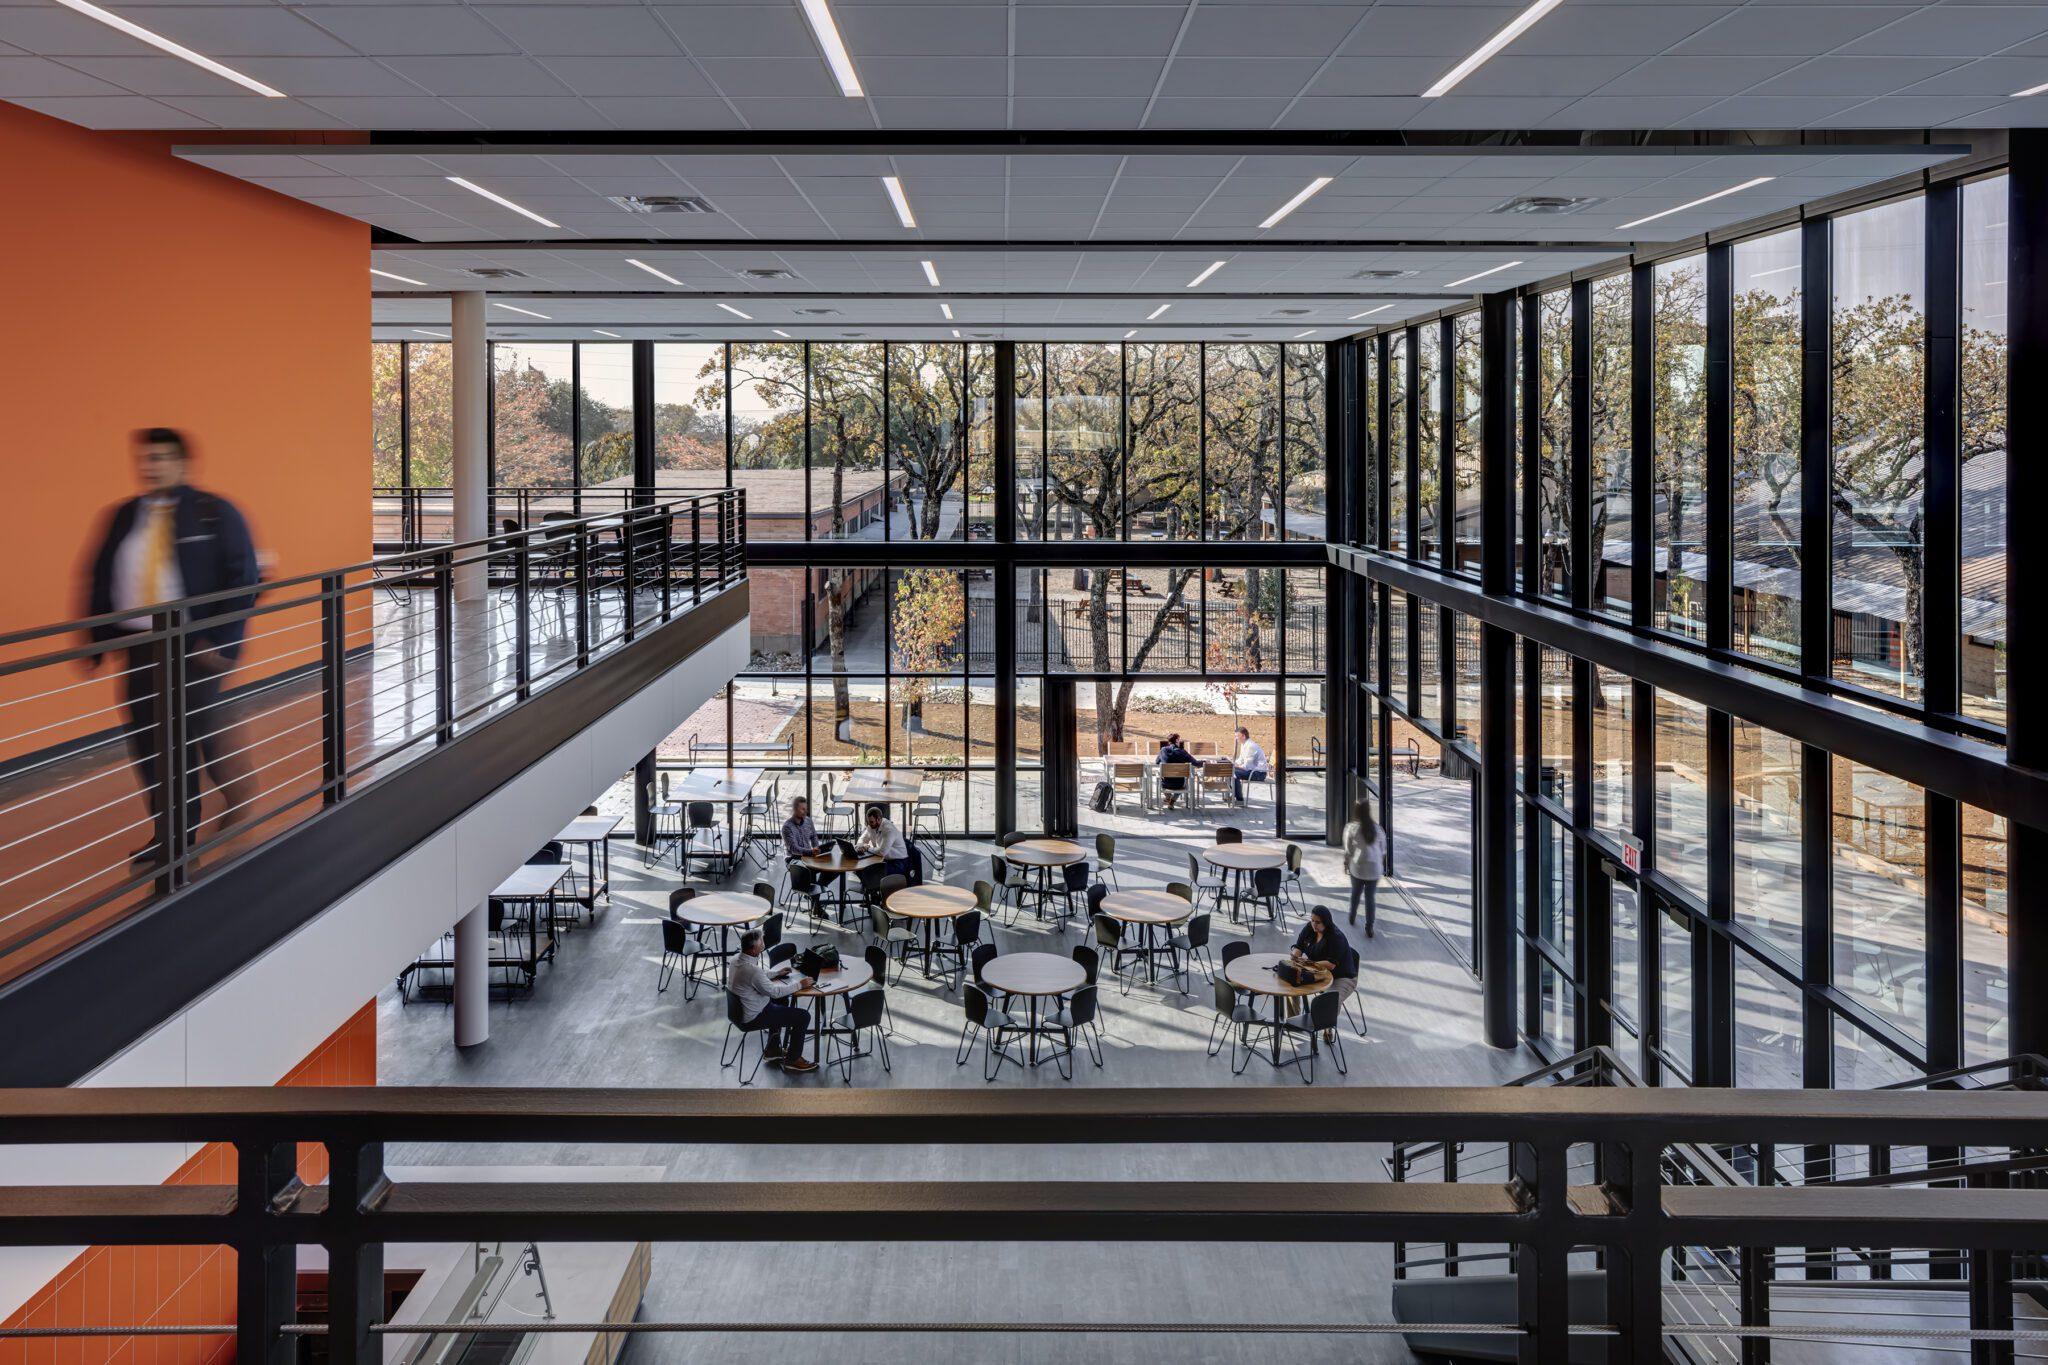 Cristo Rey Dallas Innovation Center, Main Atrium, View From 2nd Floor